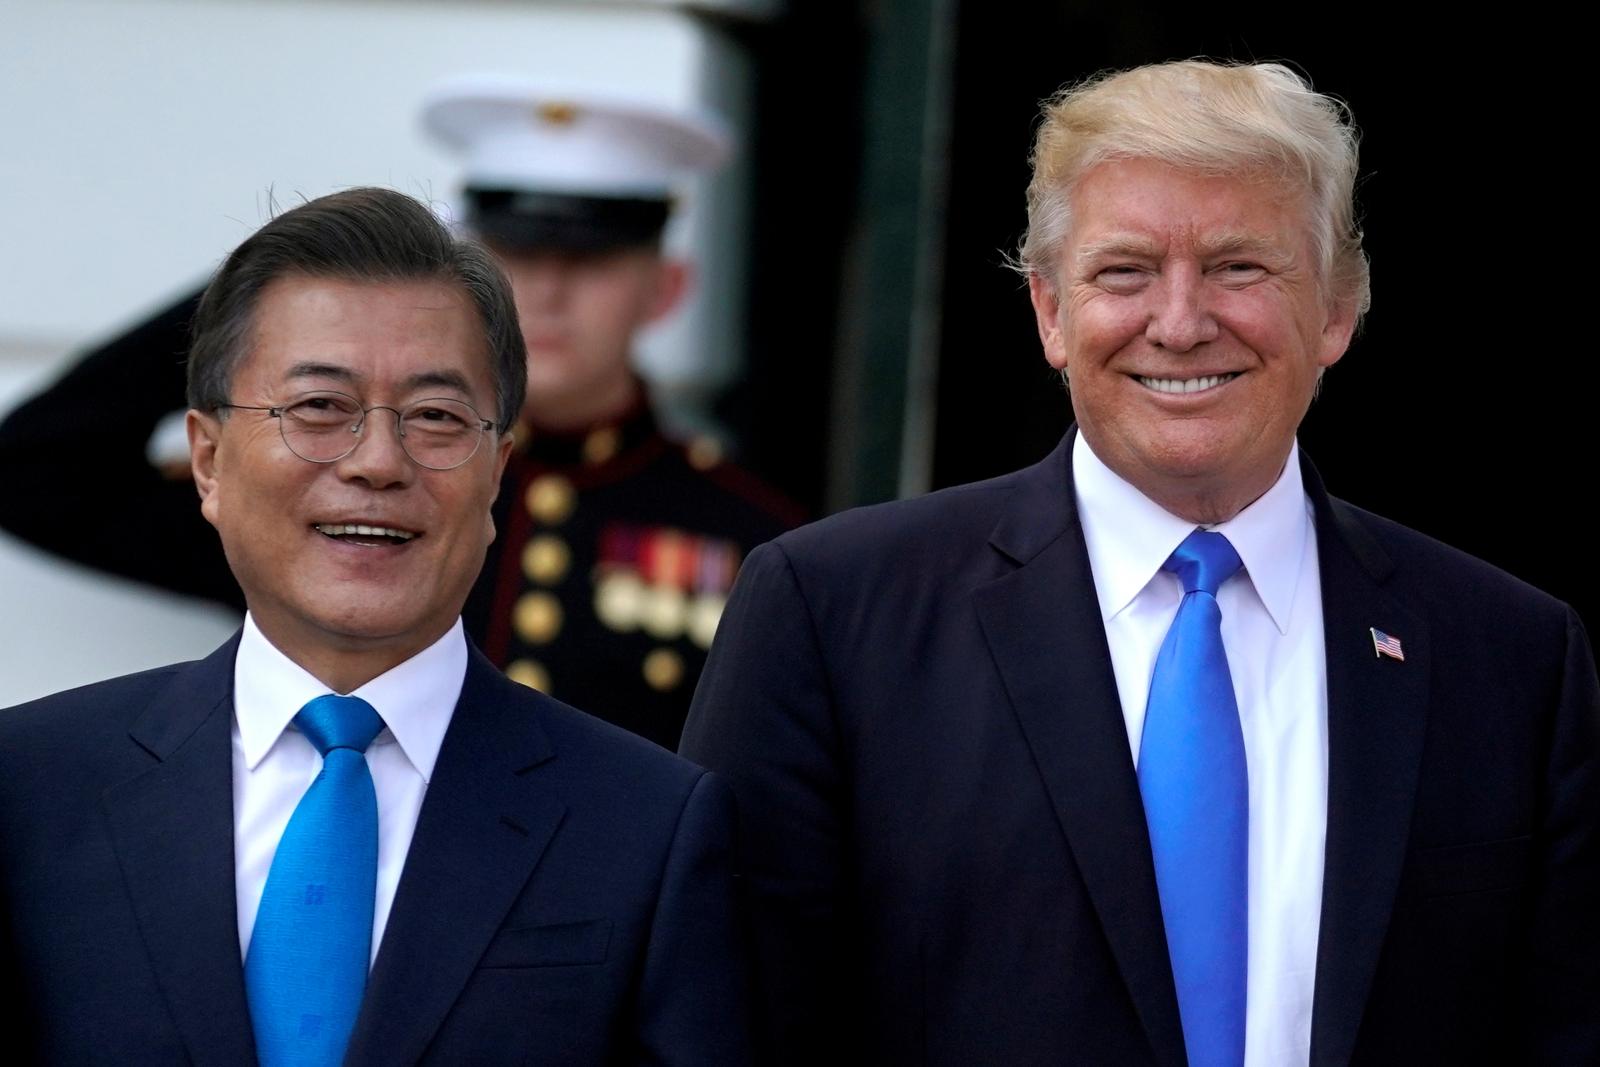 US President Donald Trump South Korean President Moon Jae-in